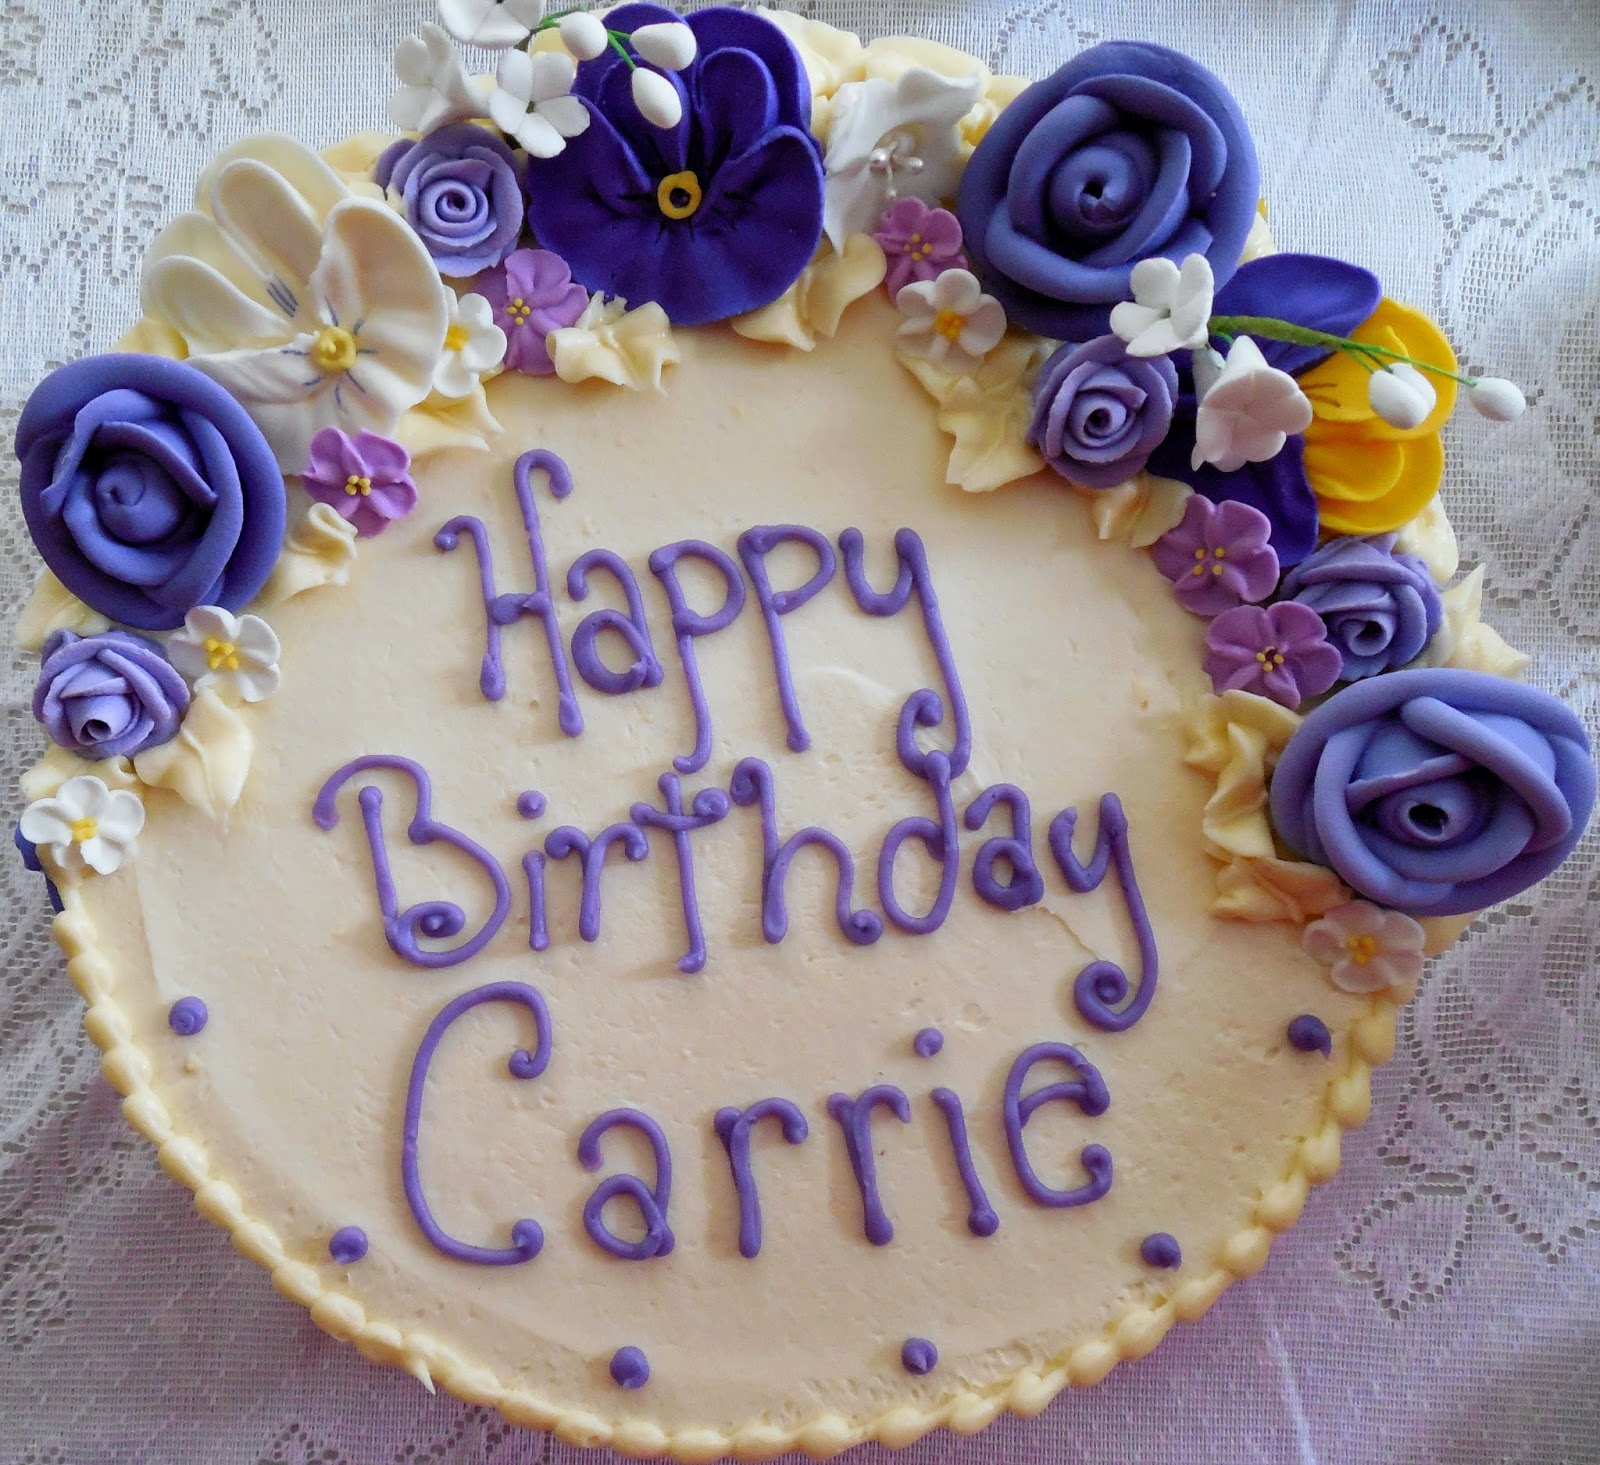 Carrie Birthday Cake